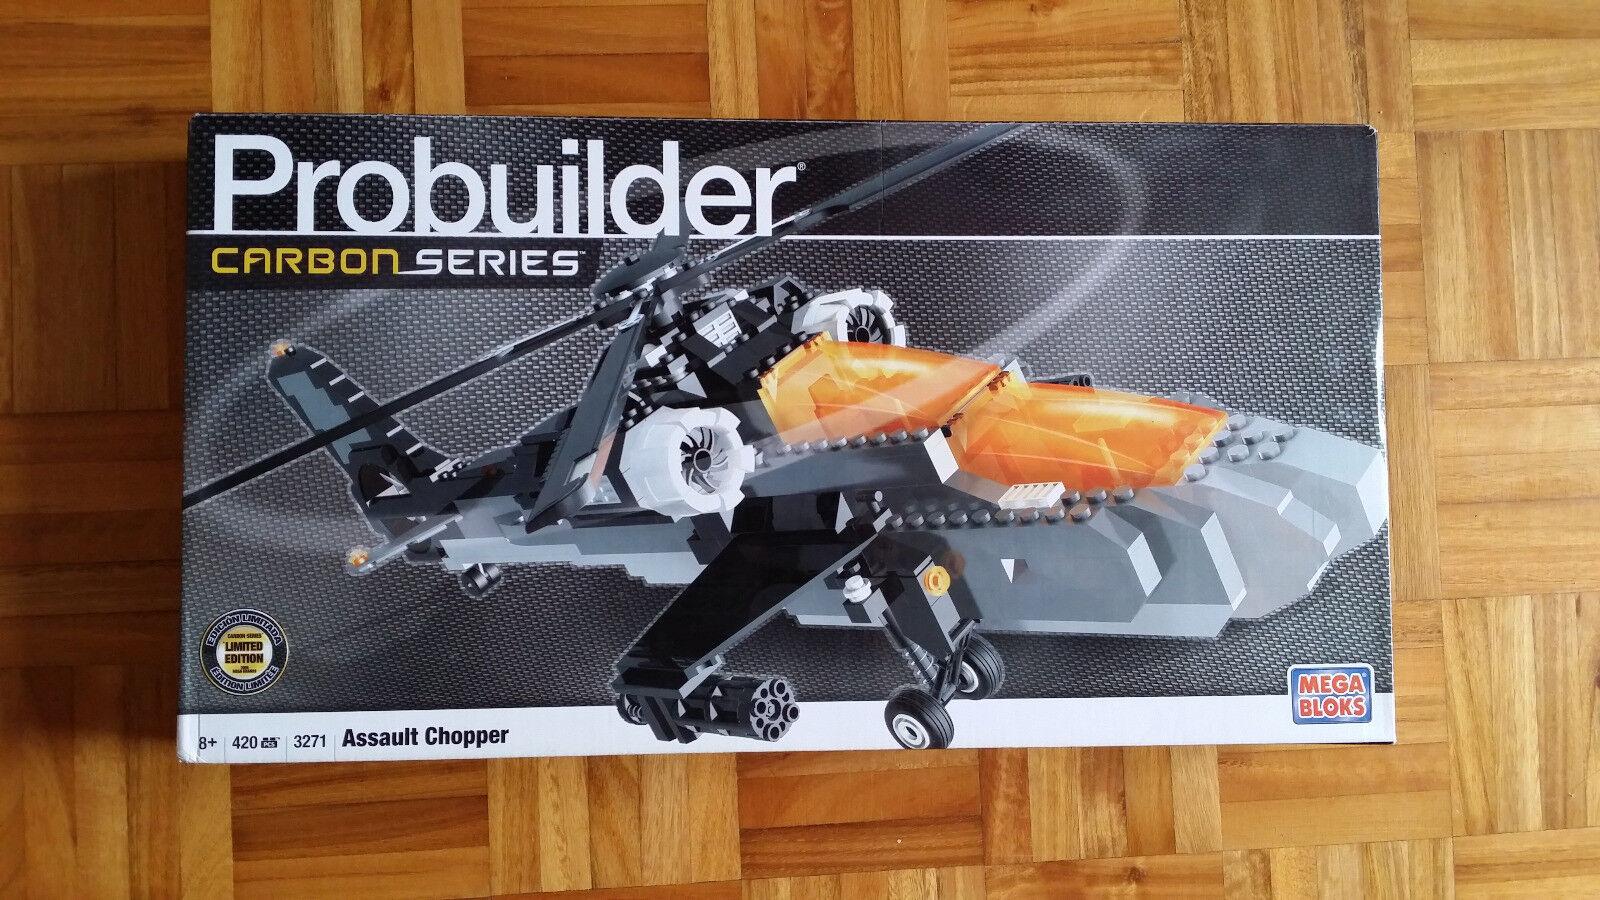 Mega Bloks Probuilder 3271 Assault Chopper 100% completo nuevo a estrenar